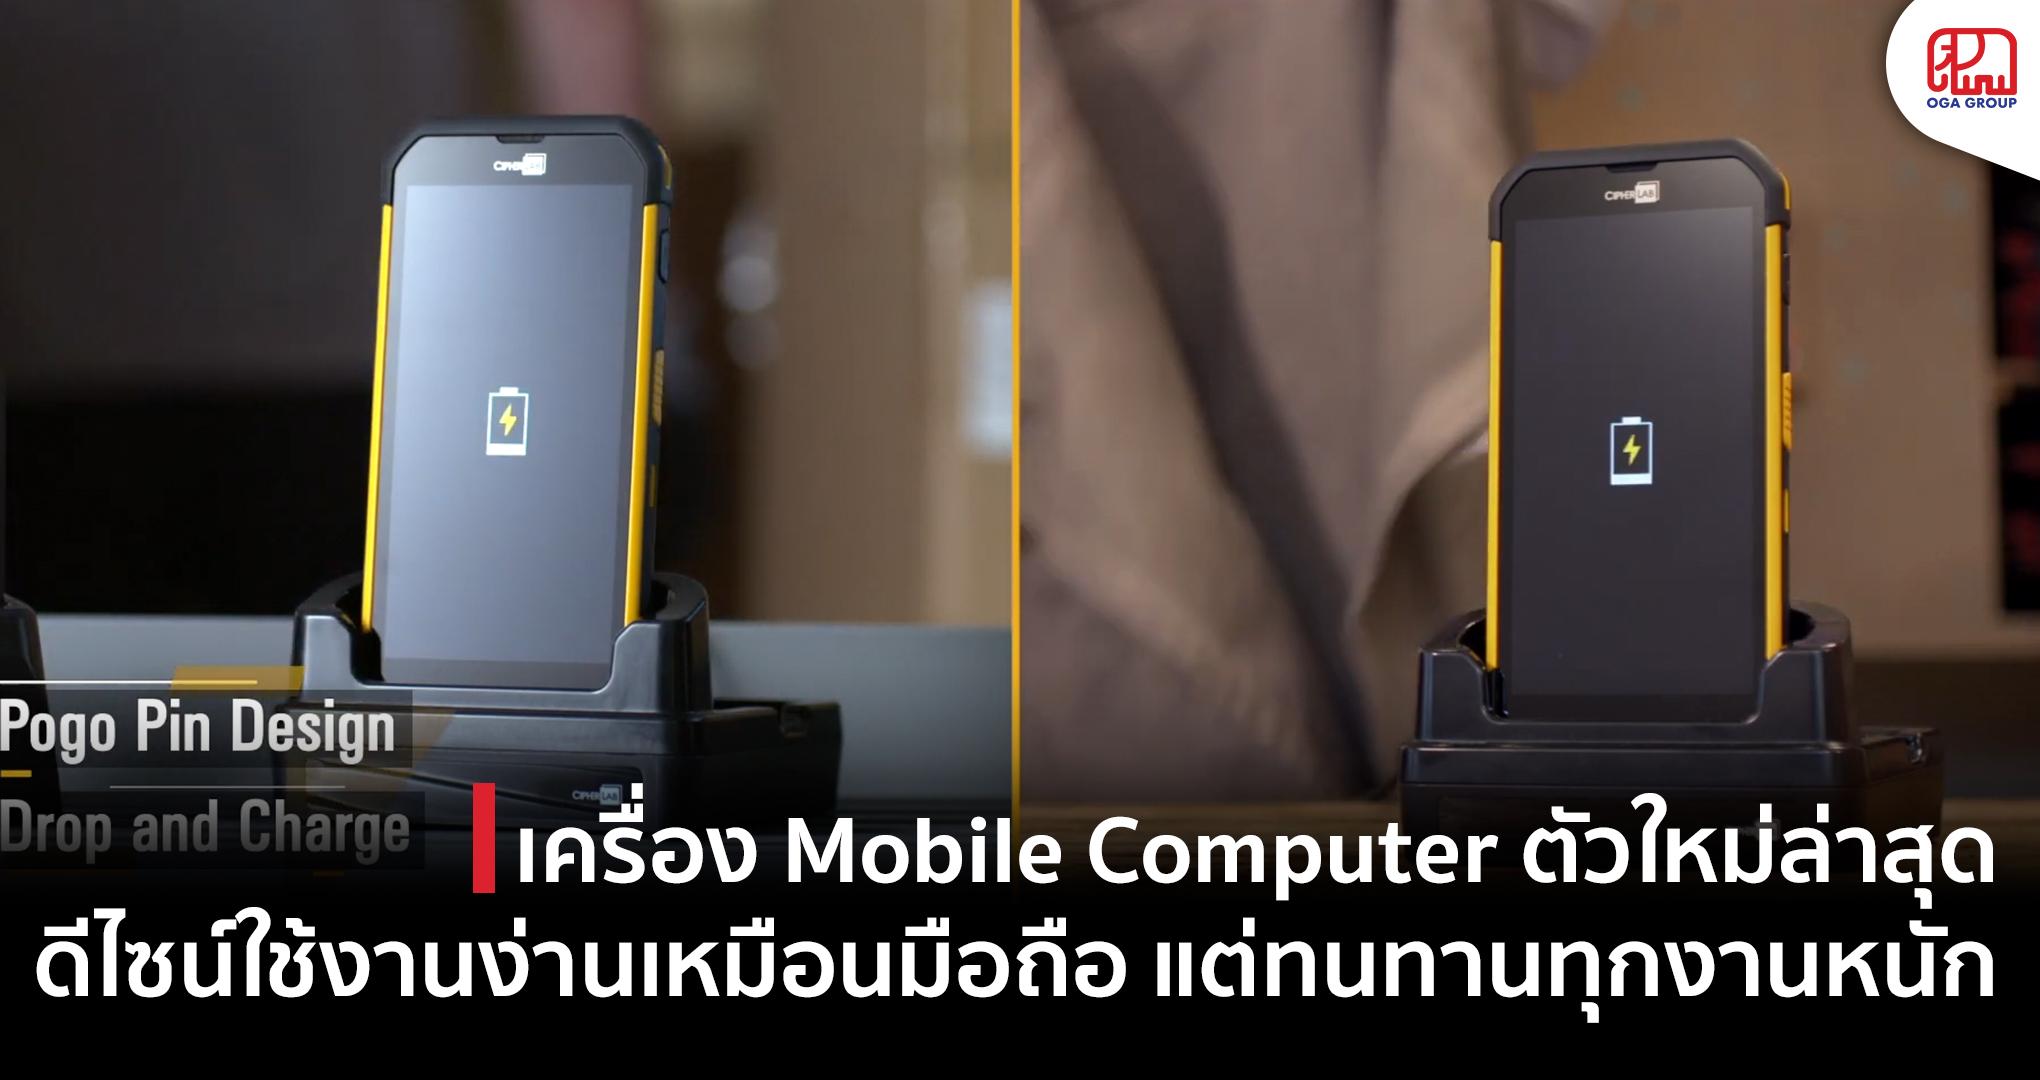 Mobile Computer คอมพิวเตอร์พกพา CipherLab RS35 ใช้งานเหมือนมือถือ ทนทานงานหนัก